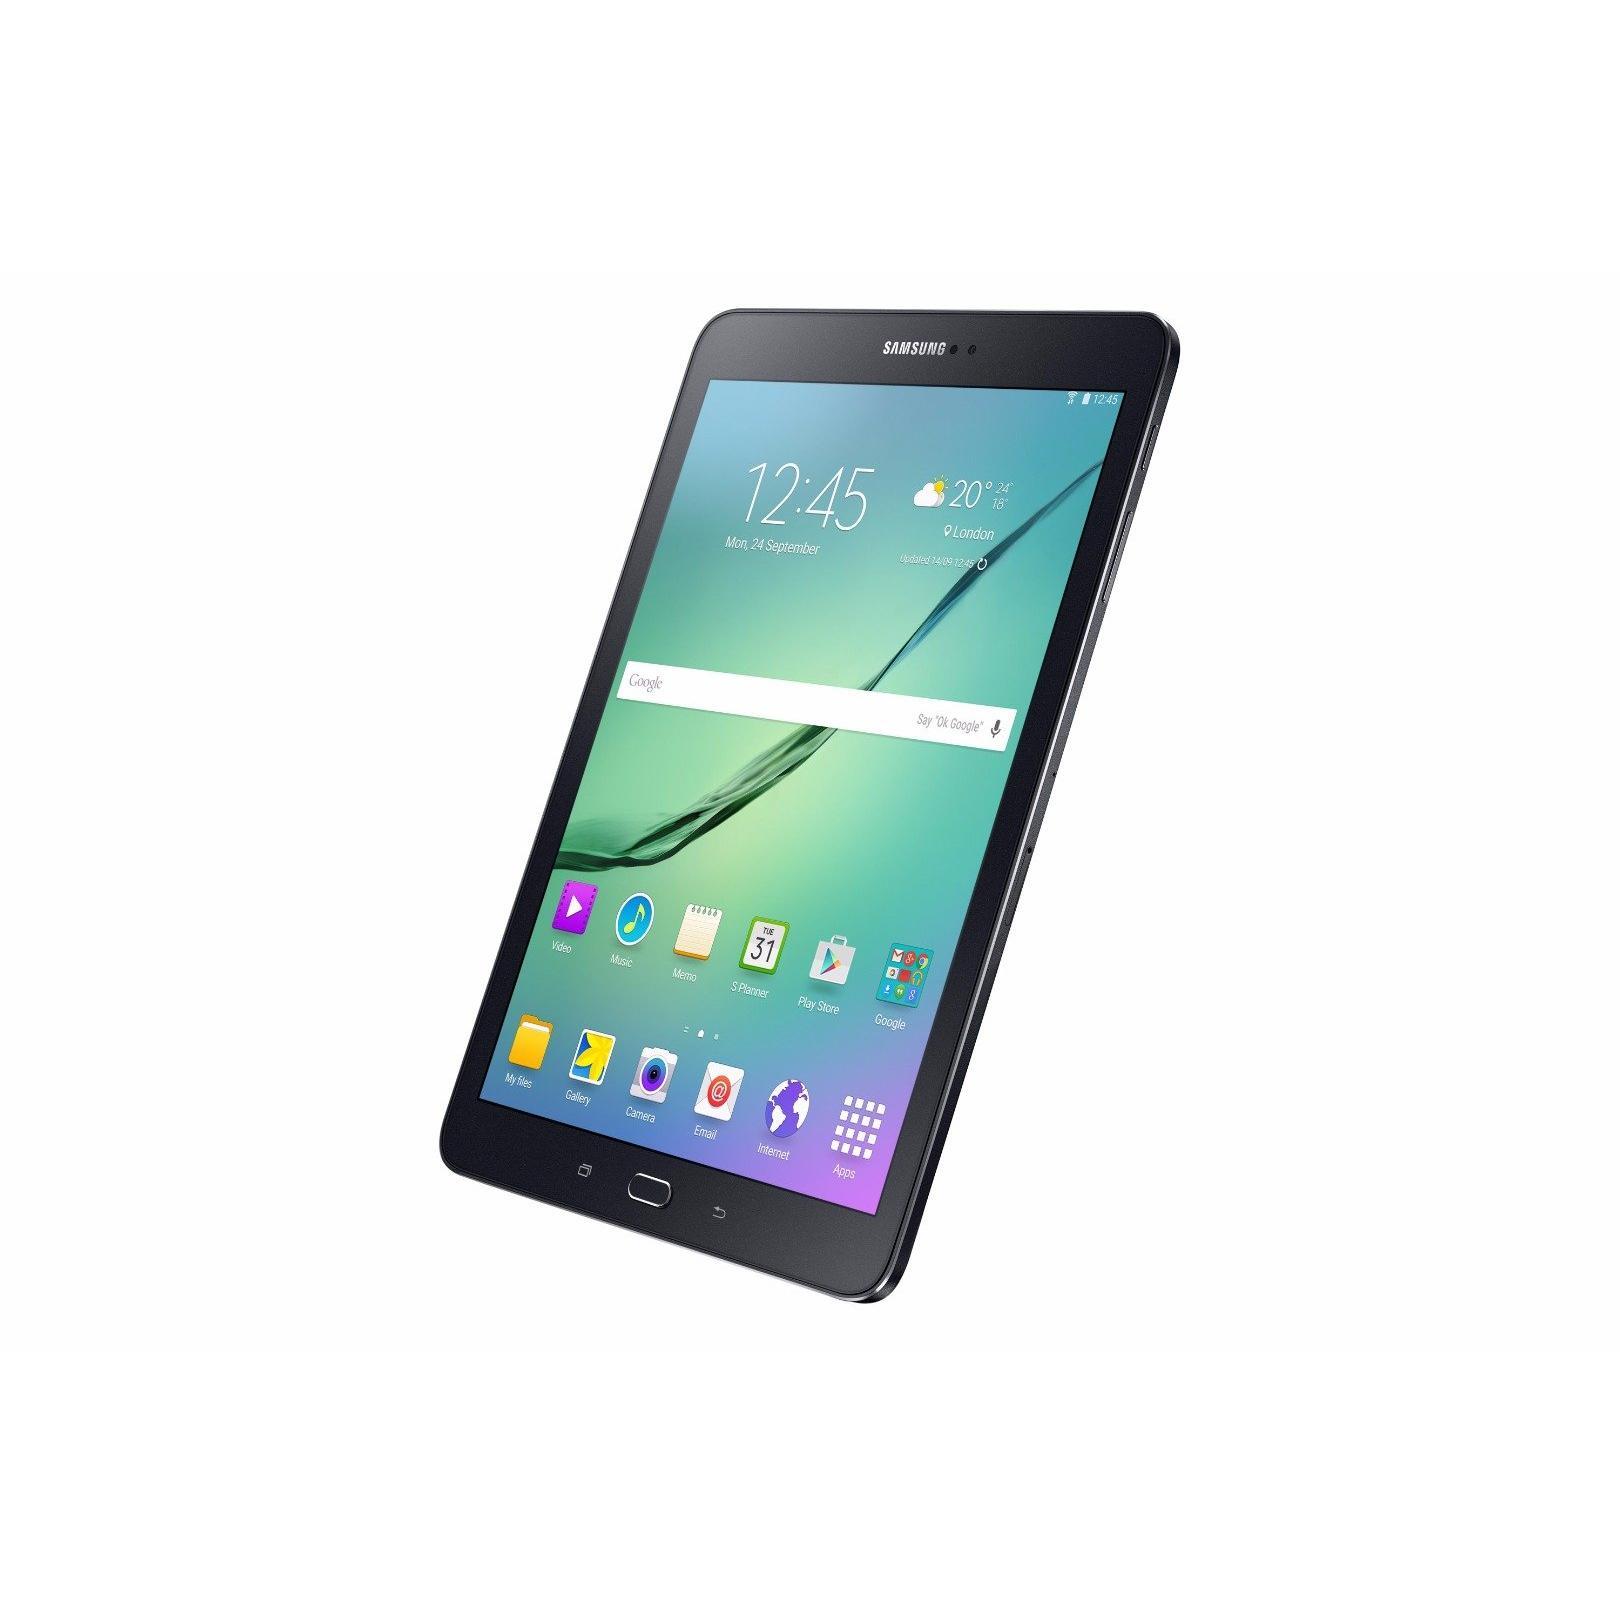 Galaxy Tab S2 32GB - Schwarz - Wlan